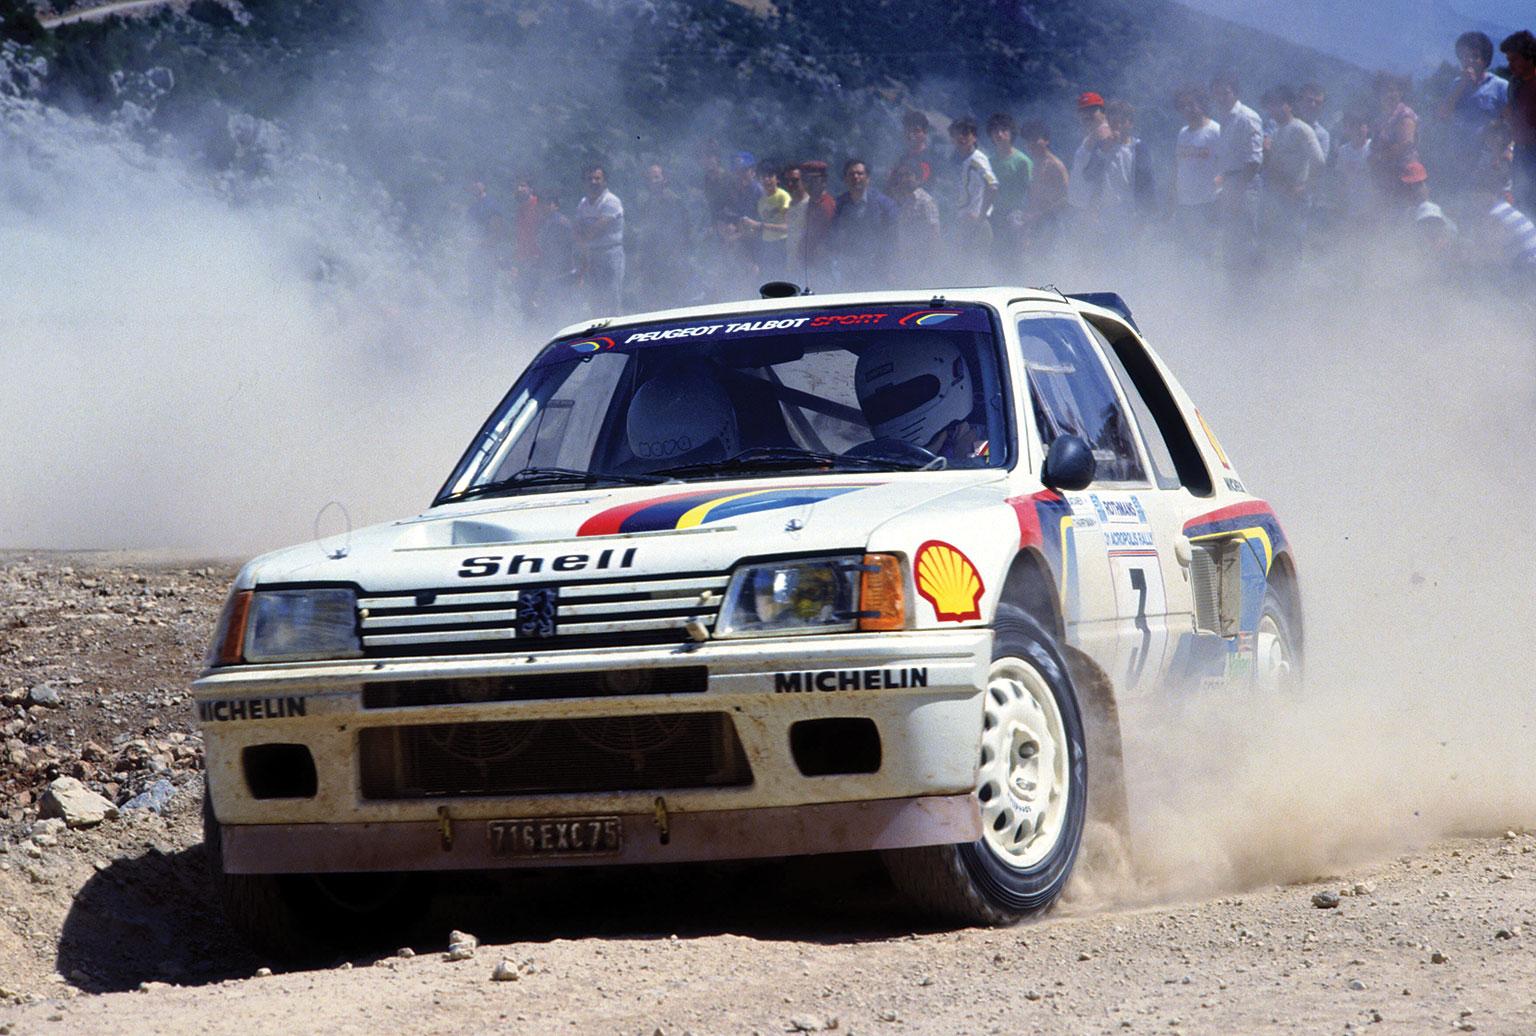 84-Acropolis-Rally-Vatanen-winner-2